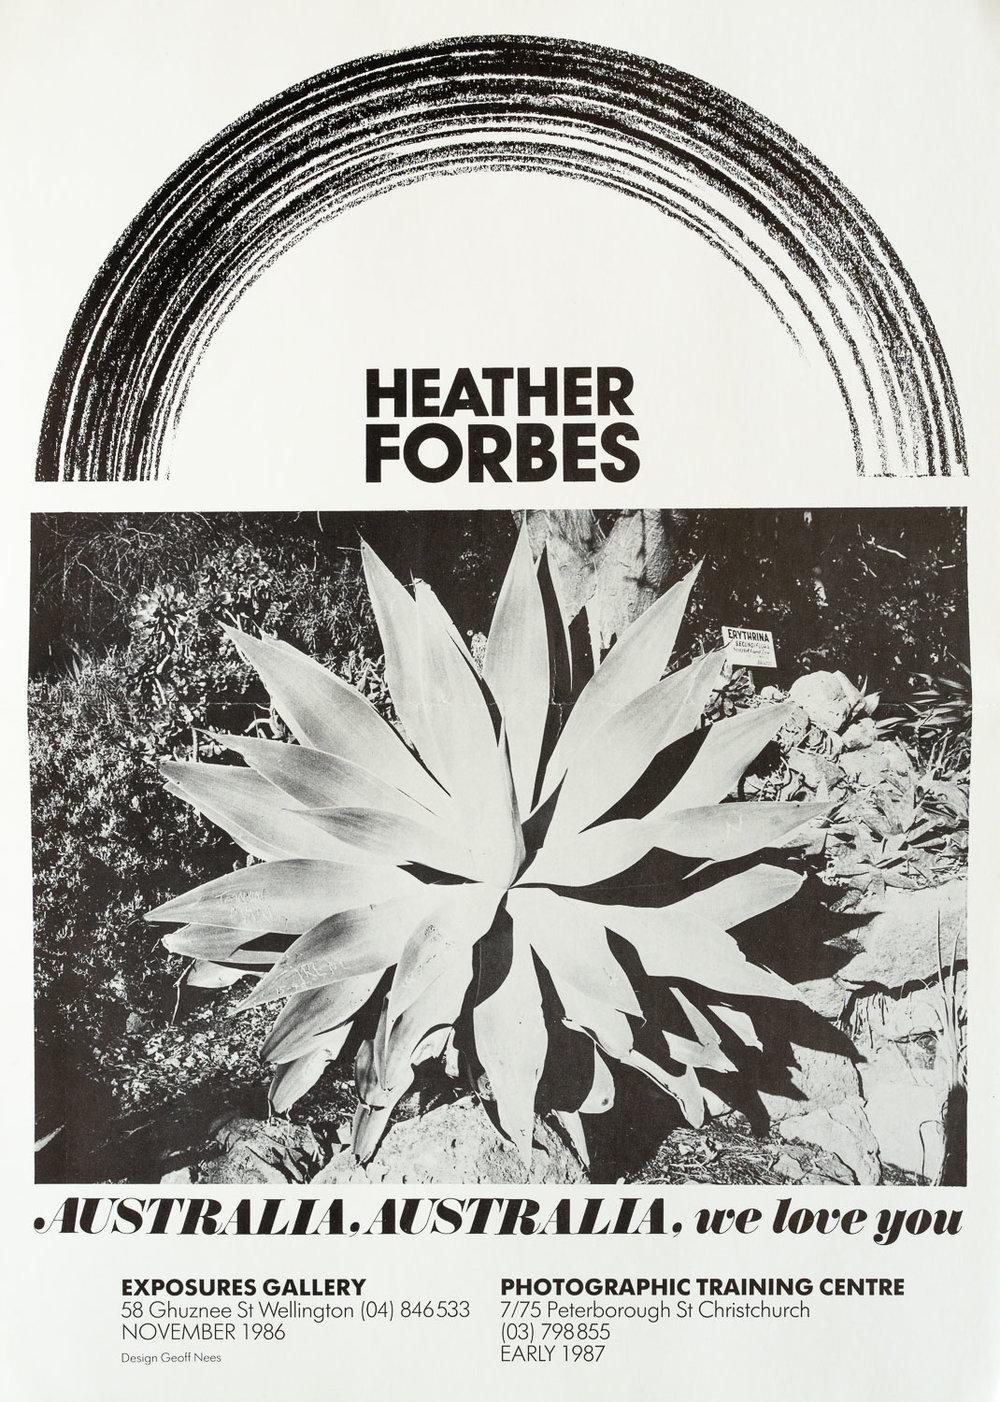 Heather ForbesAustralia, Australia, we love youNovember 1986